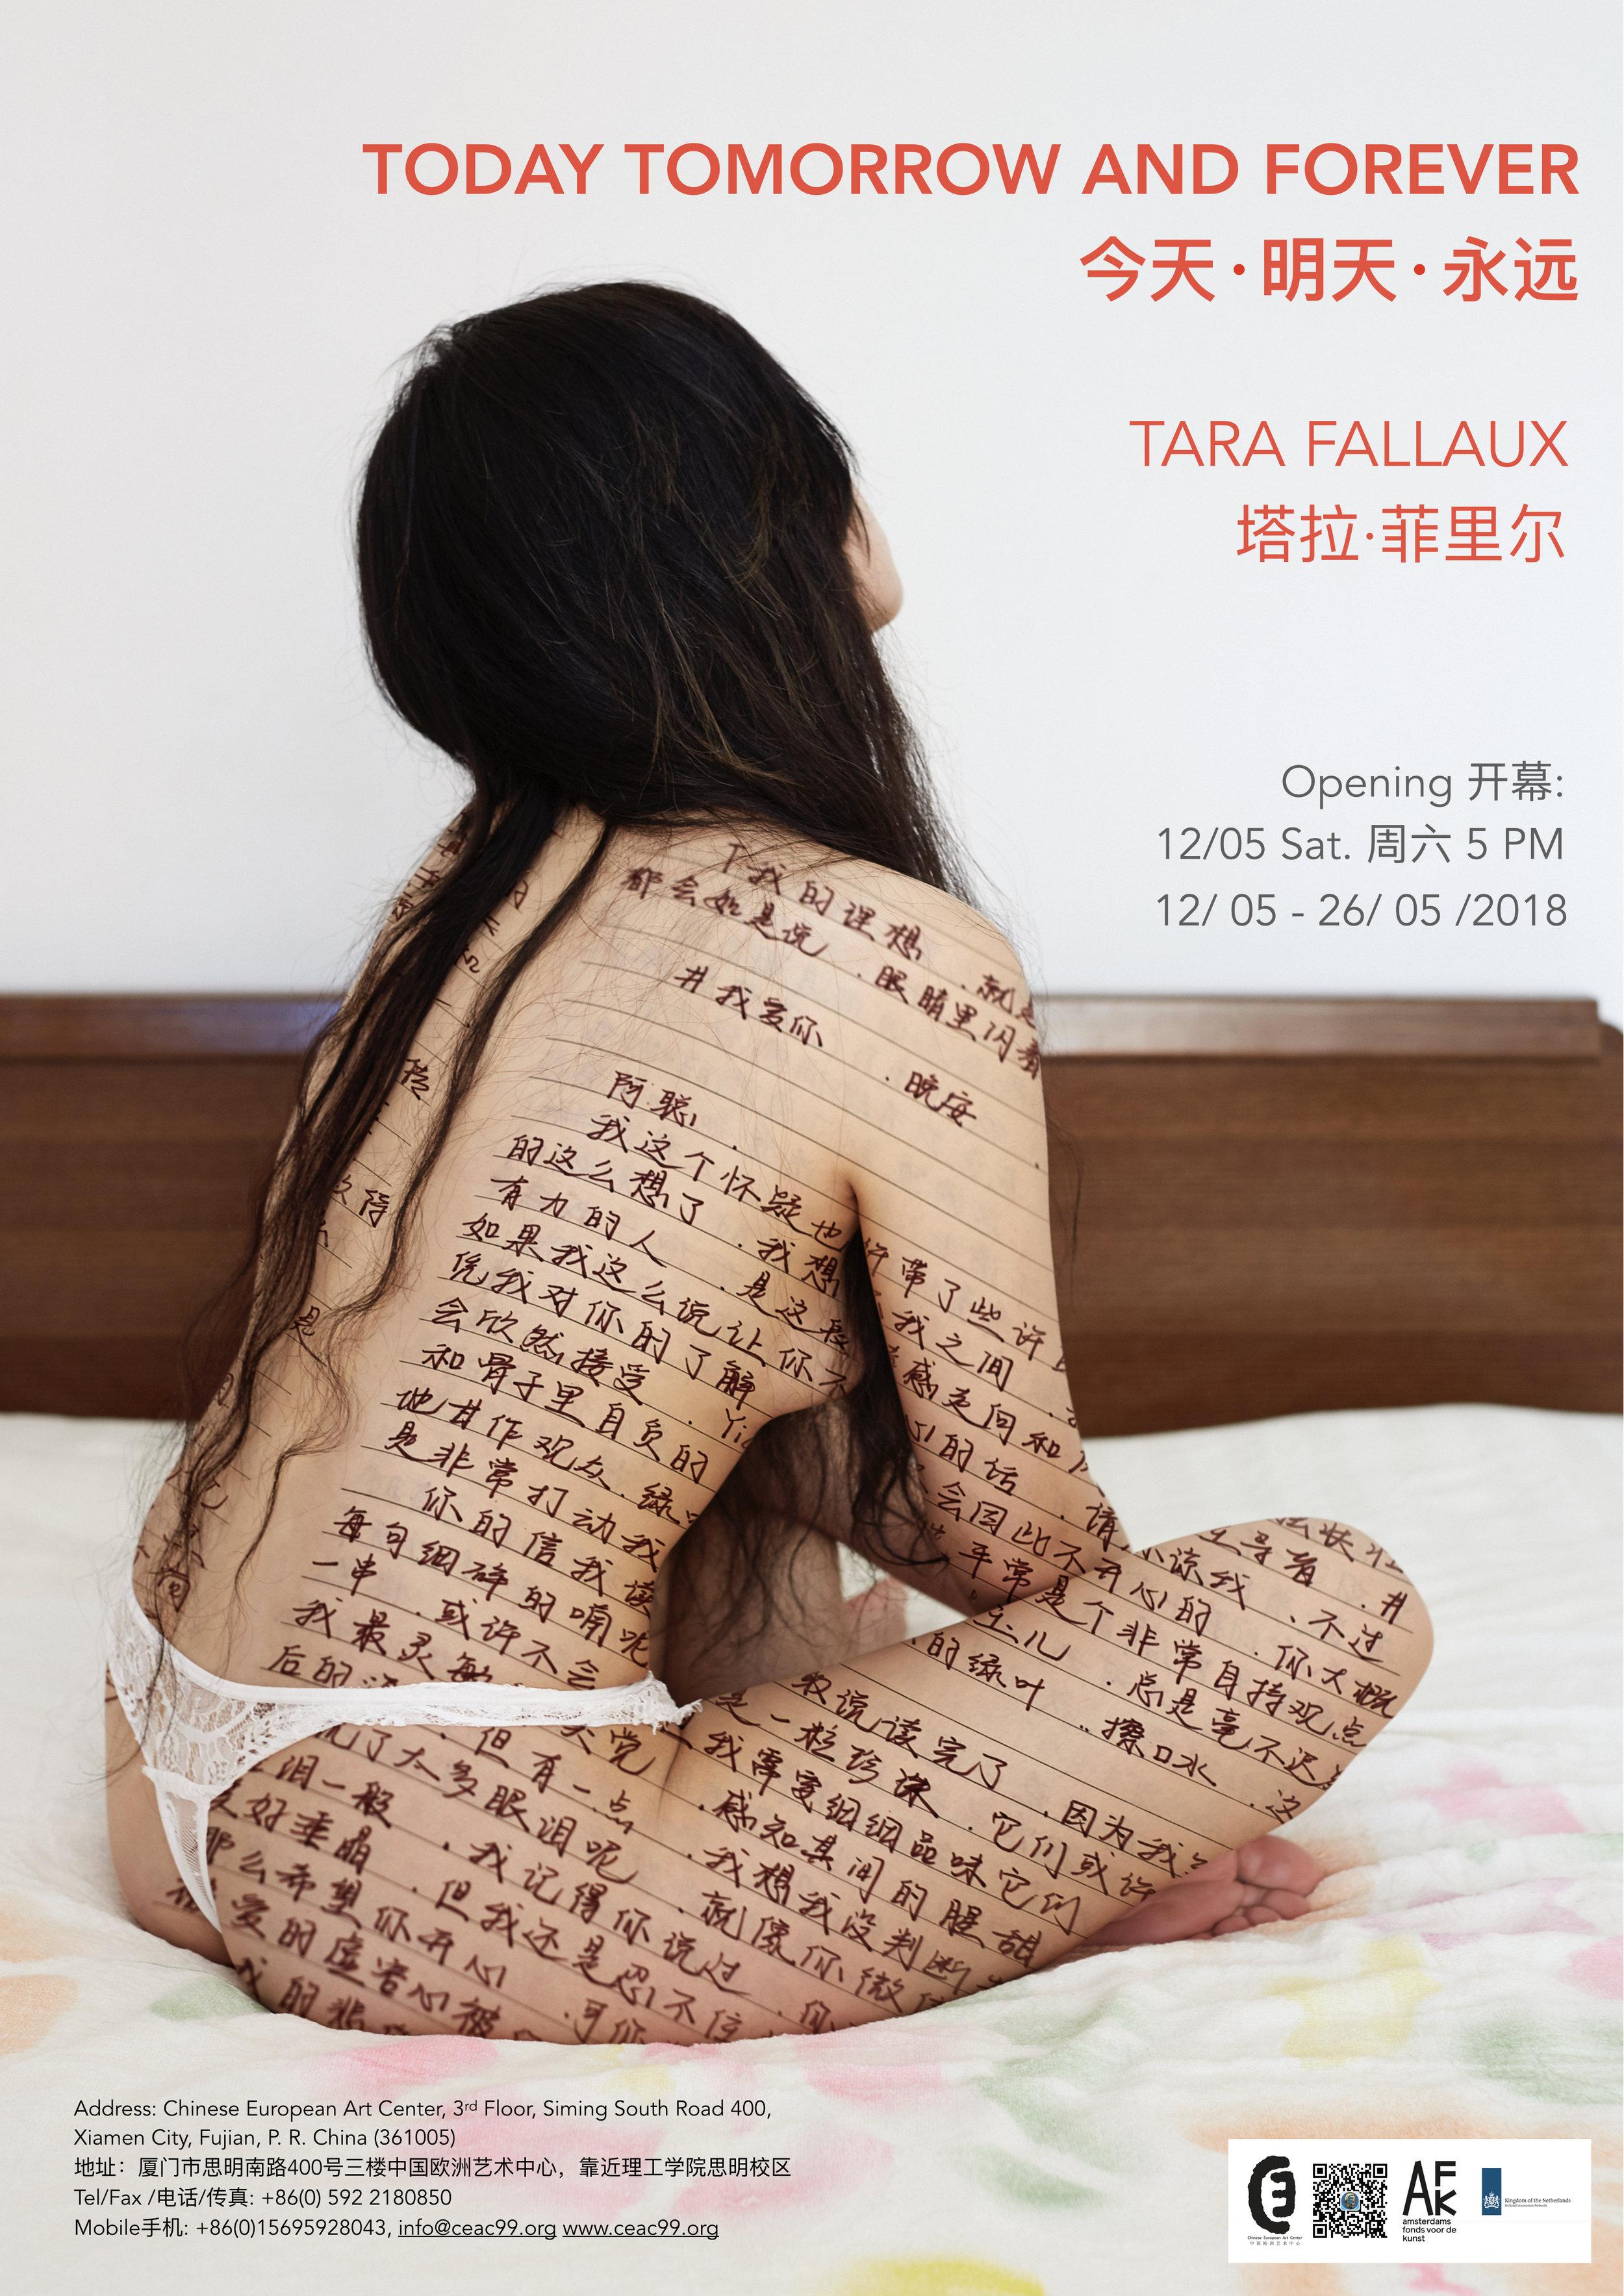 PosterTaraFallaux.001.jpeg